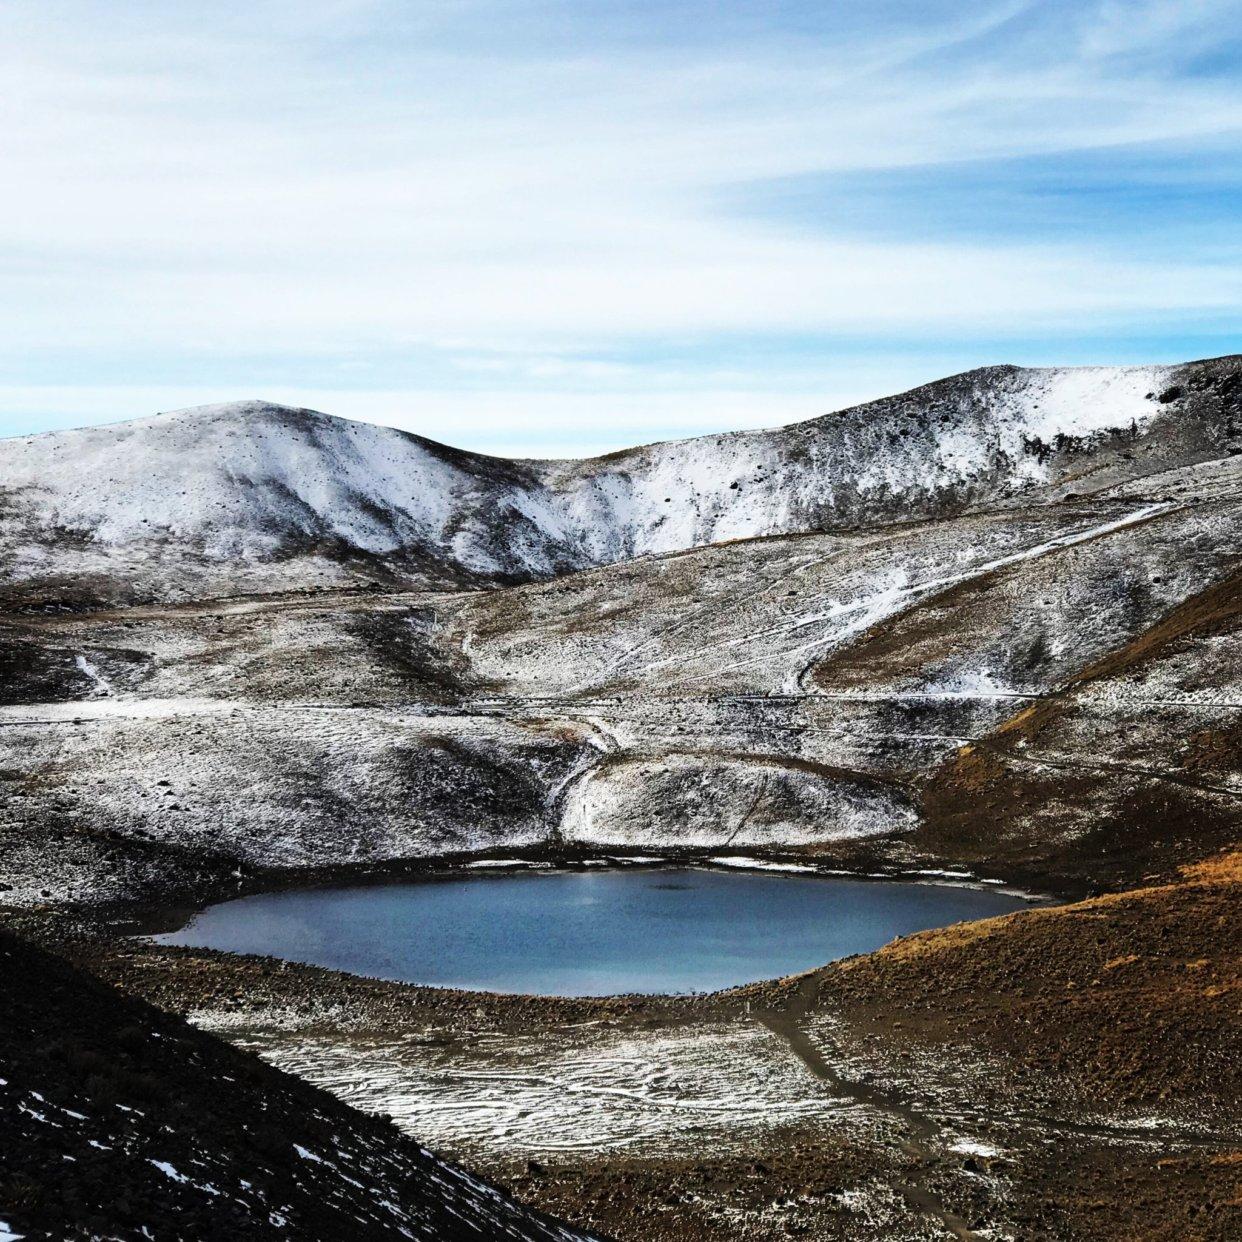 A photograph we captured hiking a volcano near CDMX